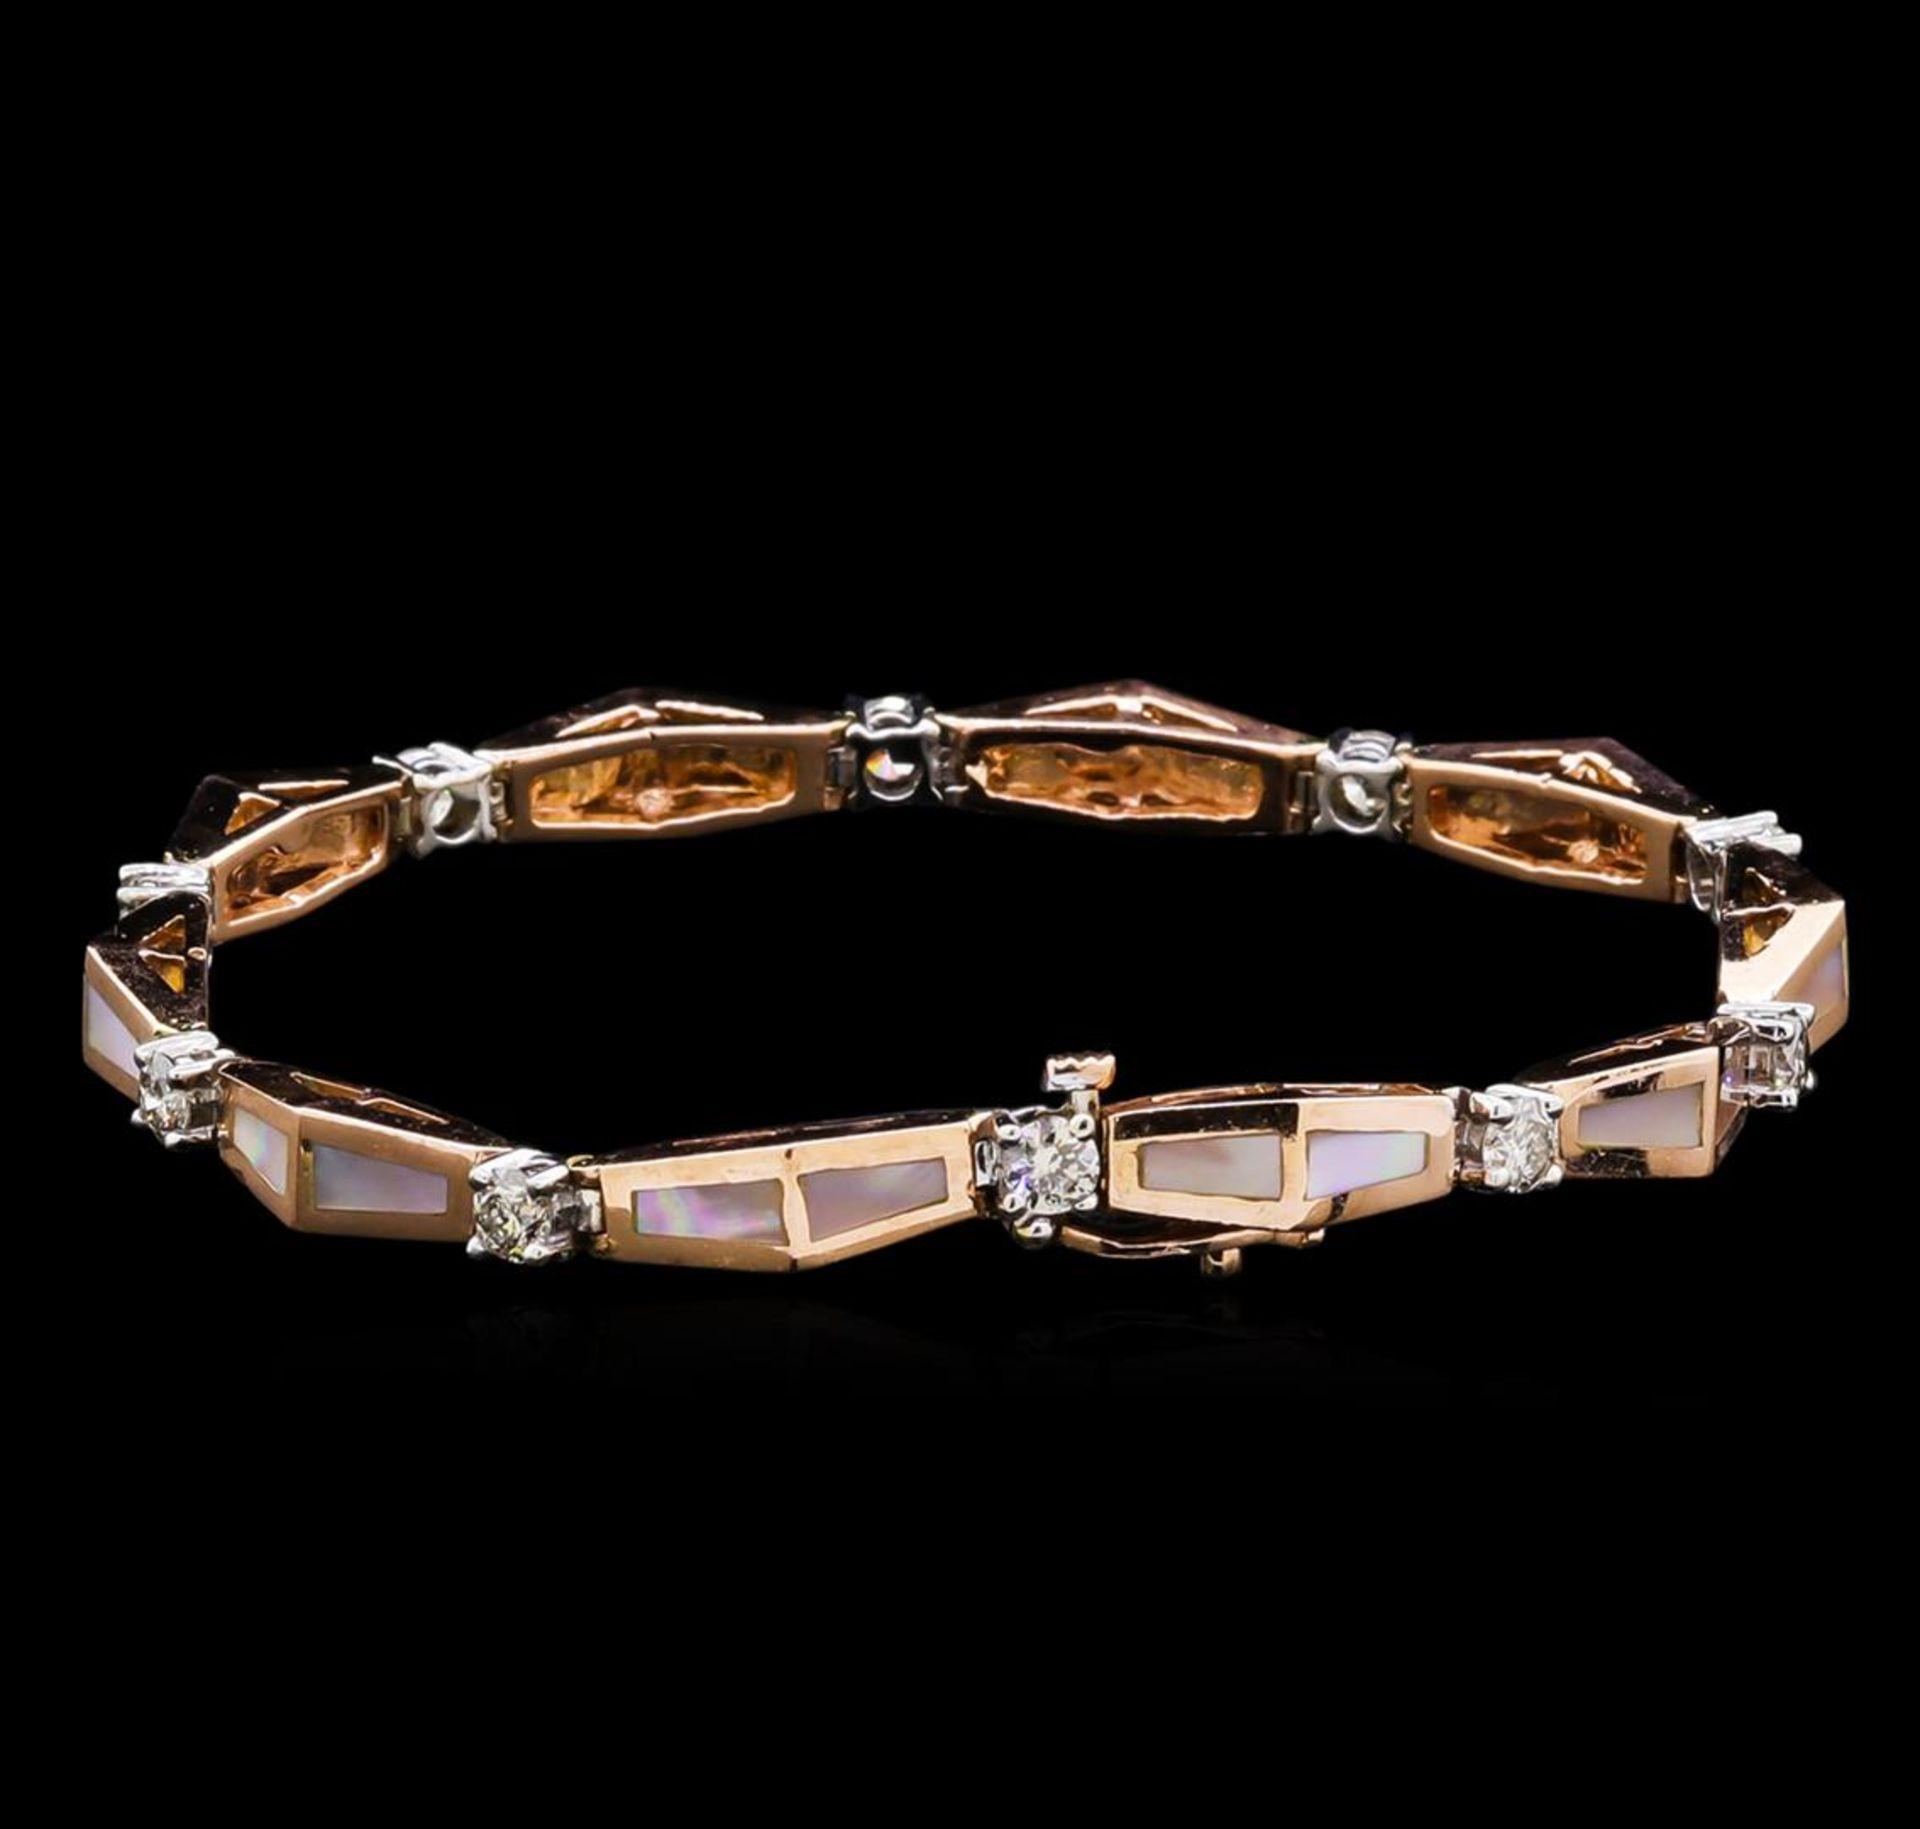 14KT Two-Tone Gold 0.67 ctw Diamond Bracelet - Image 2 of 4